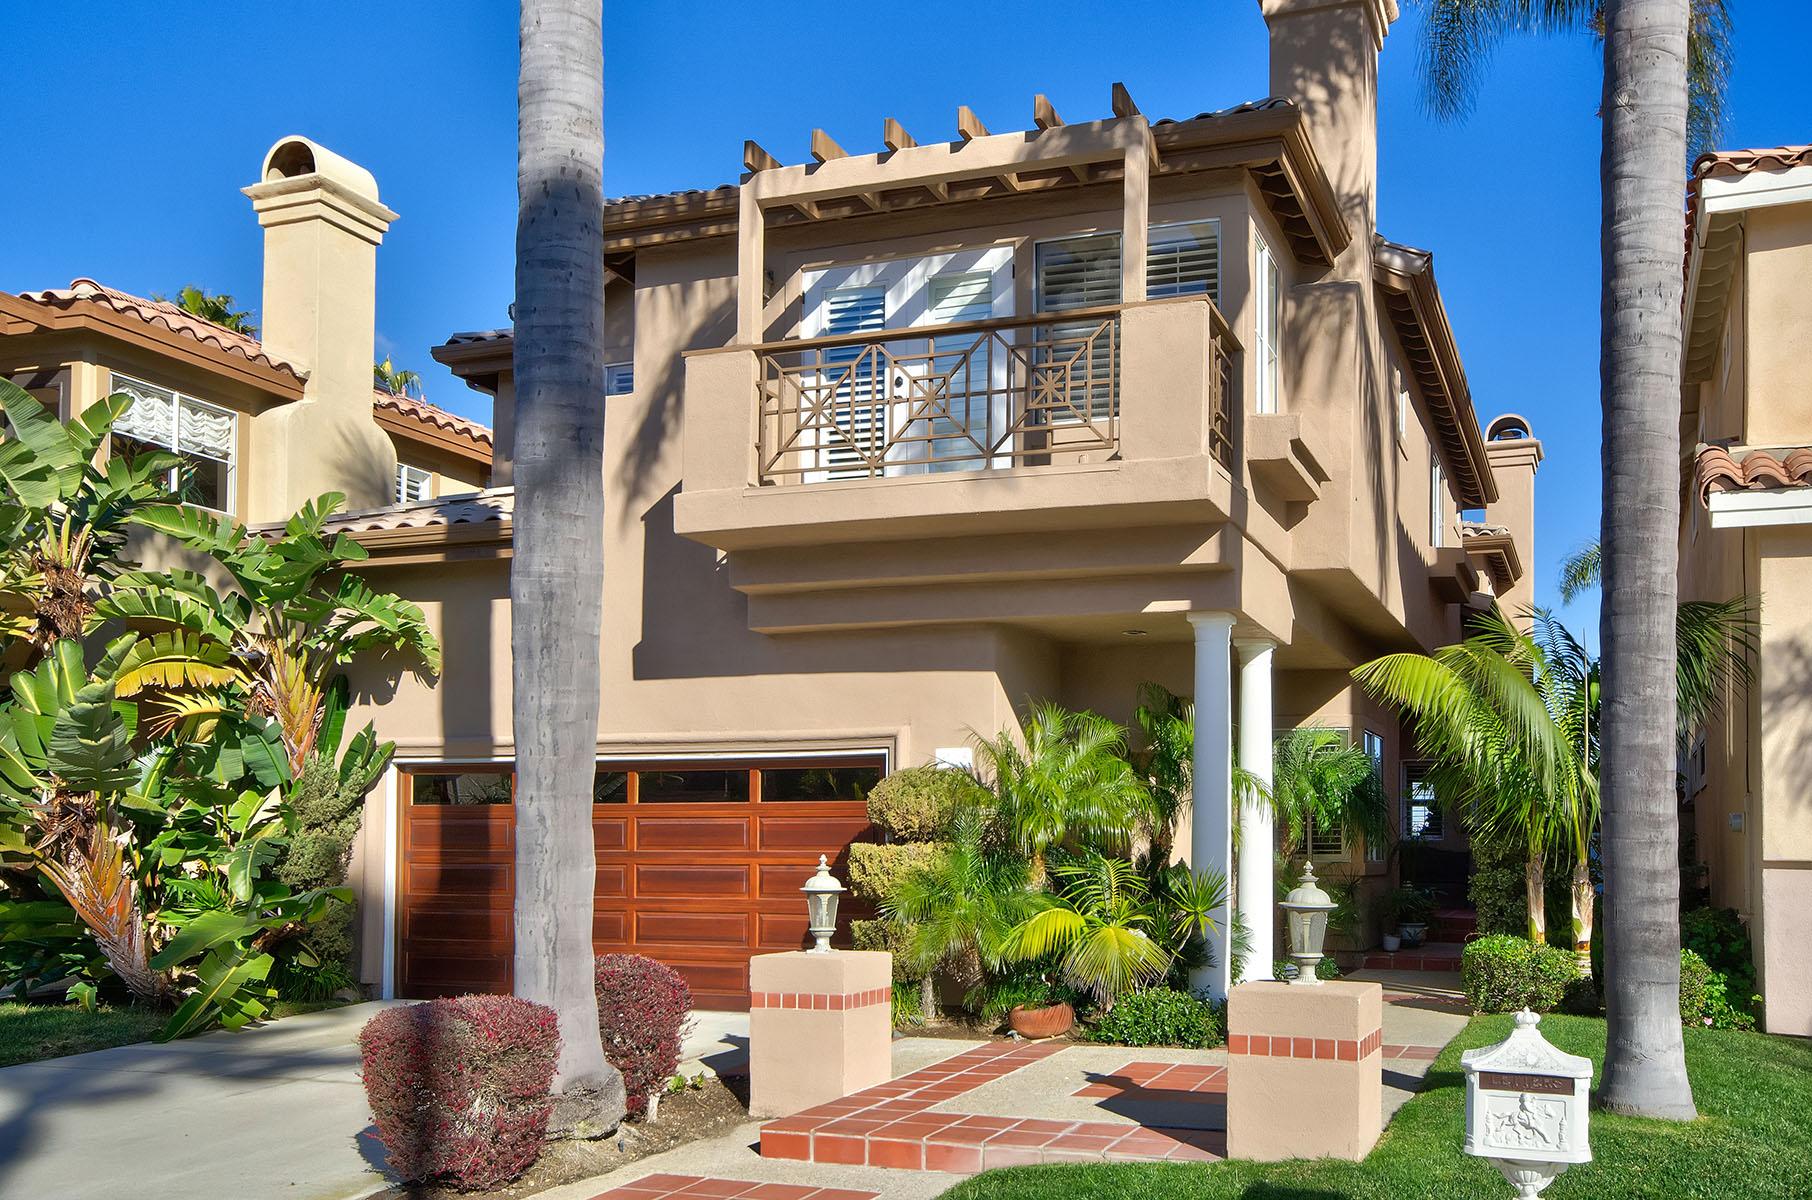 Single Family Home for Sale at 31586 Sea Shadows Way Laguna Niguel, California 92677 United States